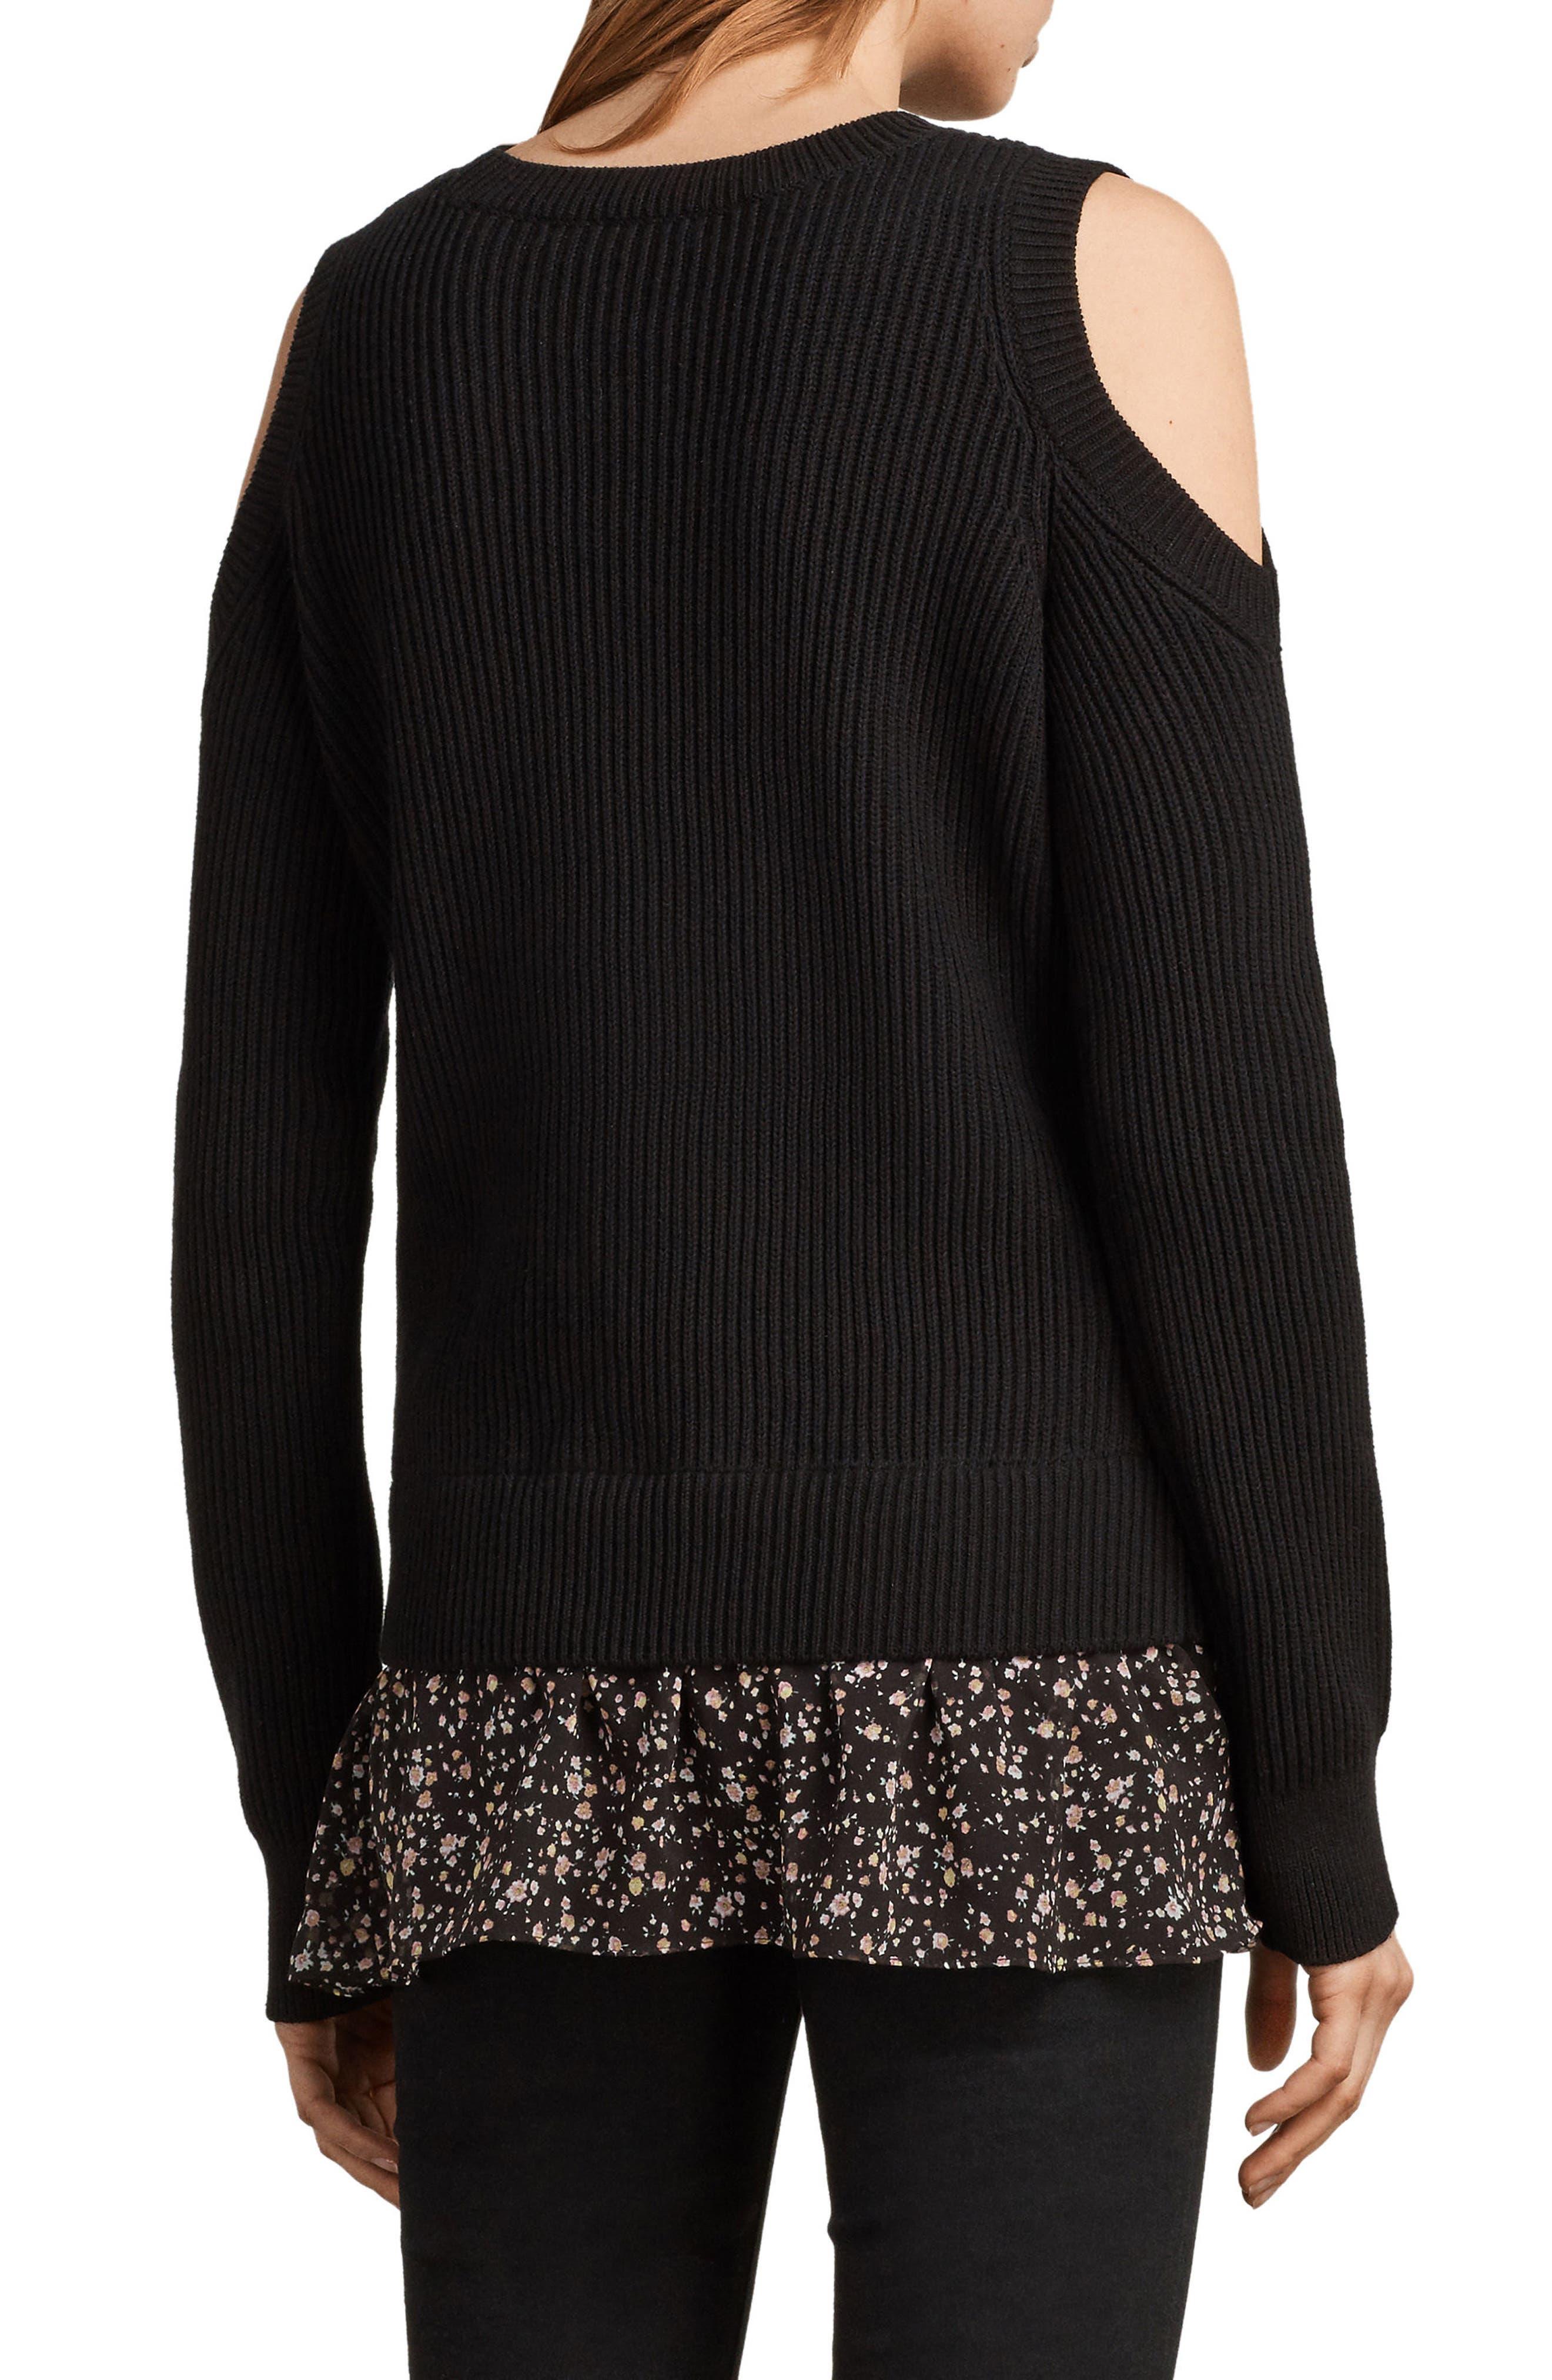 Pepper Cold Shoulder Sweater,                             Alternate thumbnail 2, color,                             001